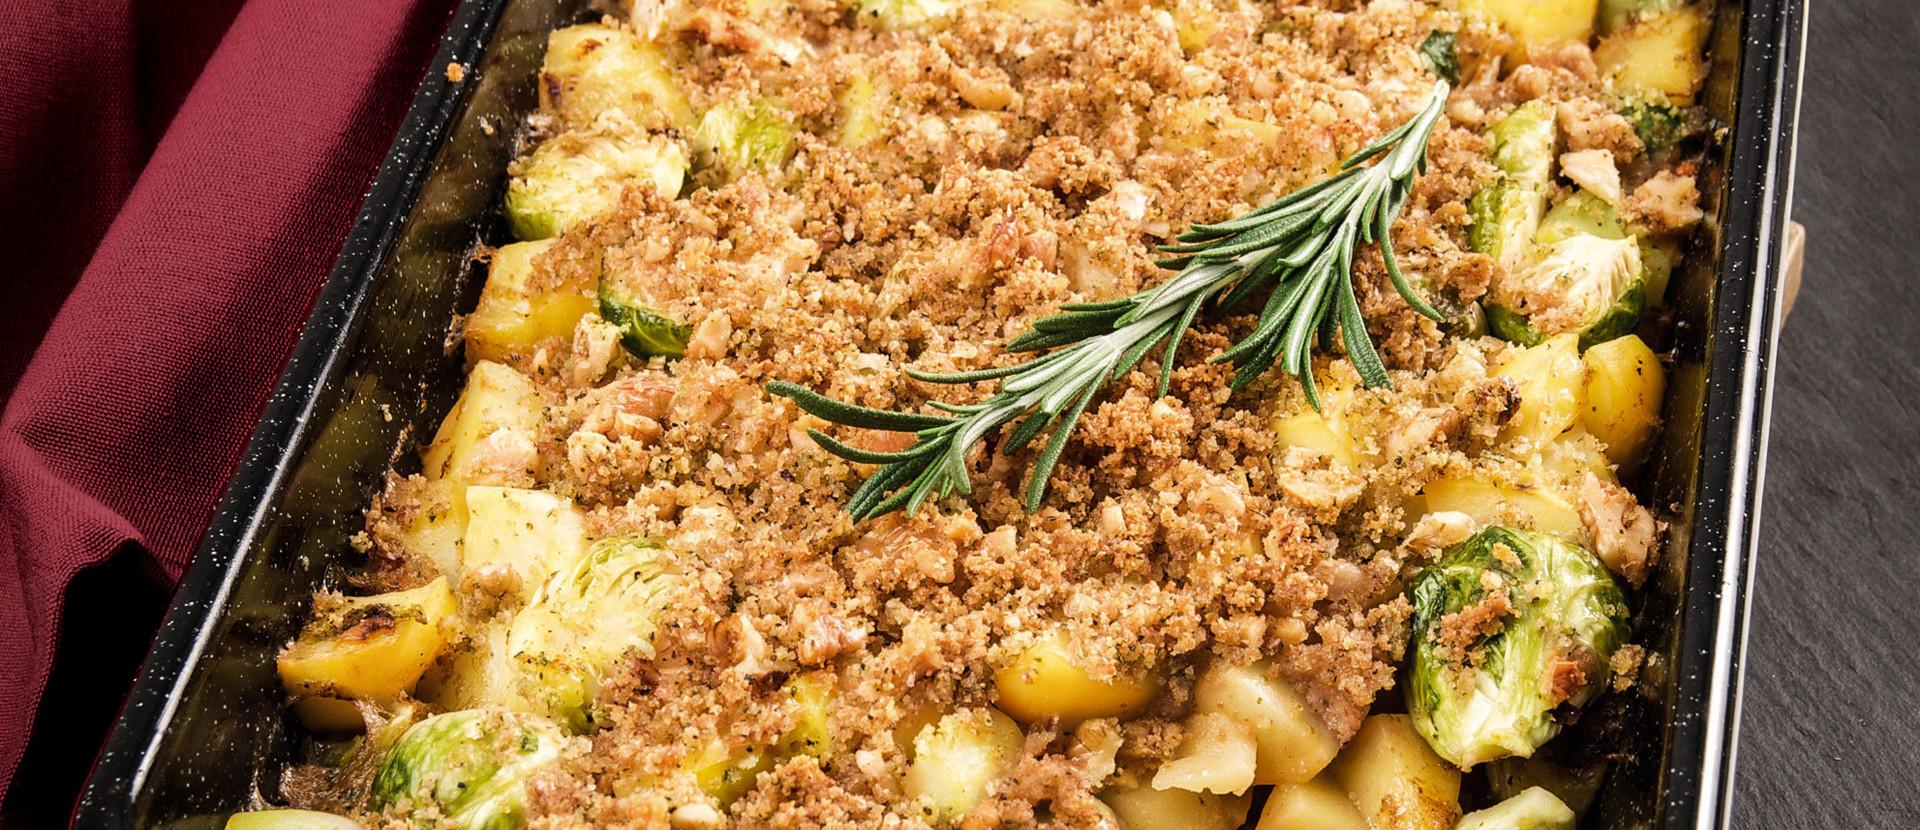 Rosenkohlauflauf Kartoffel Rosmarinstreusel